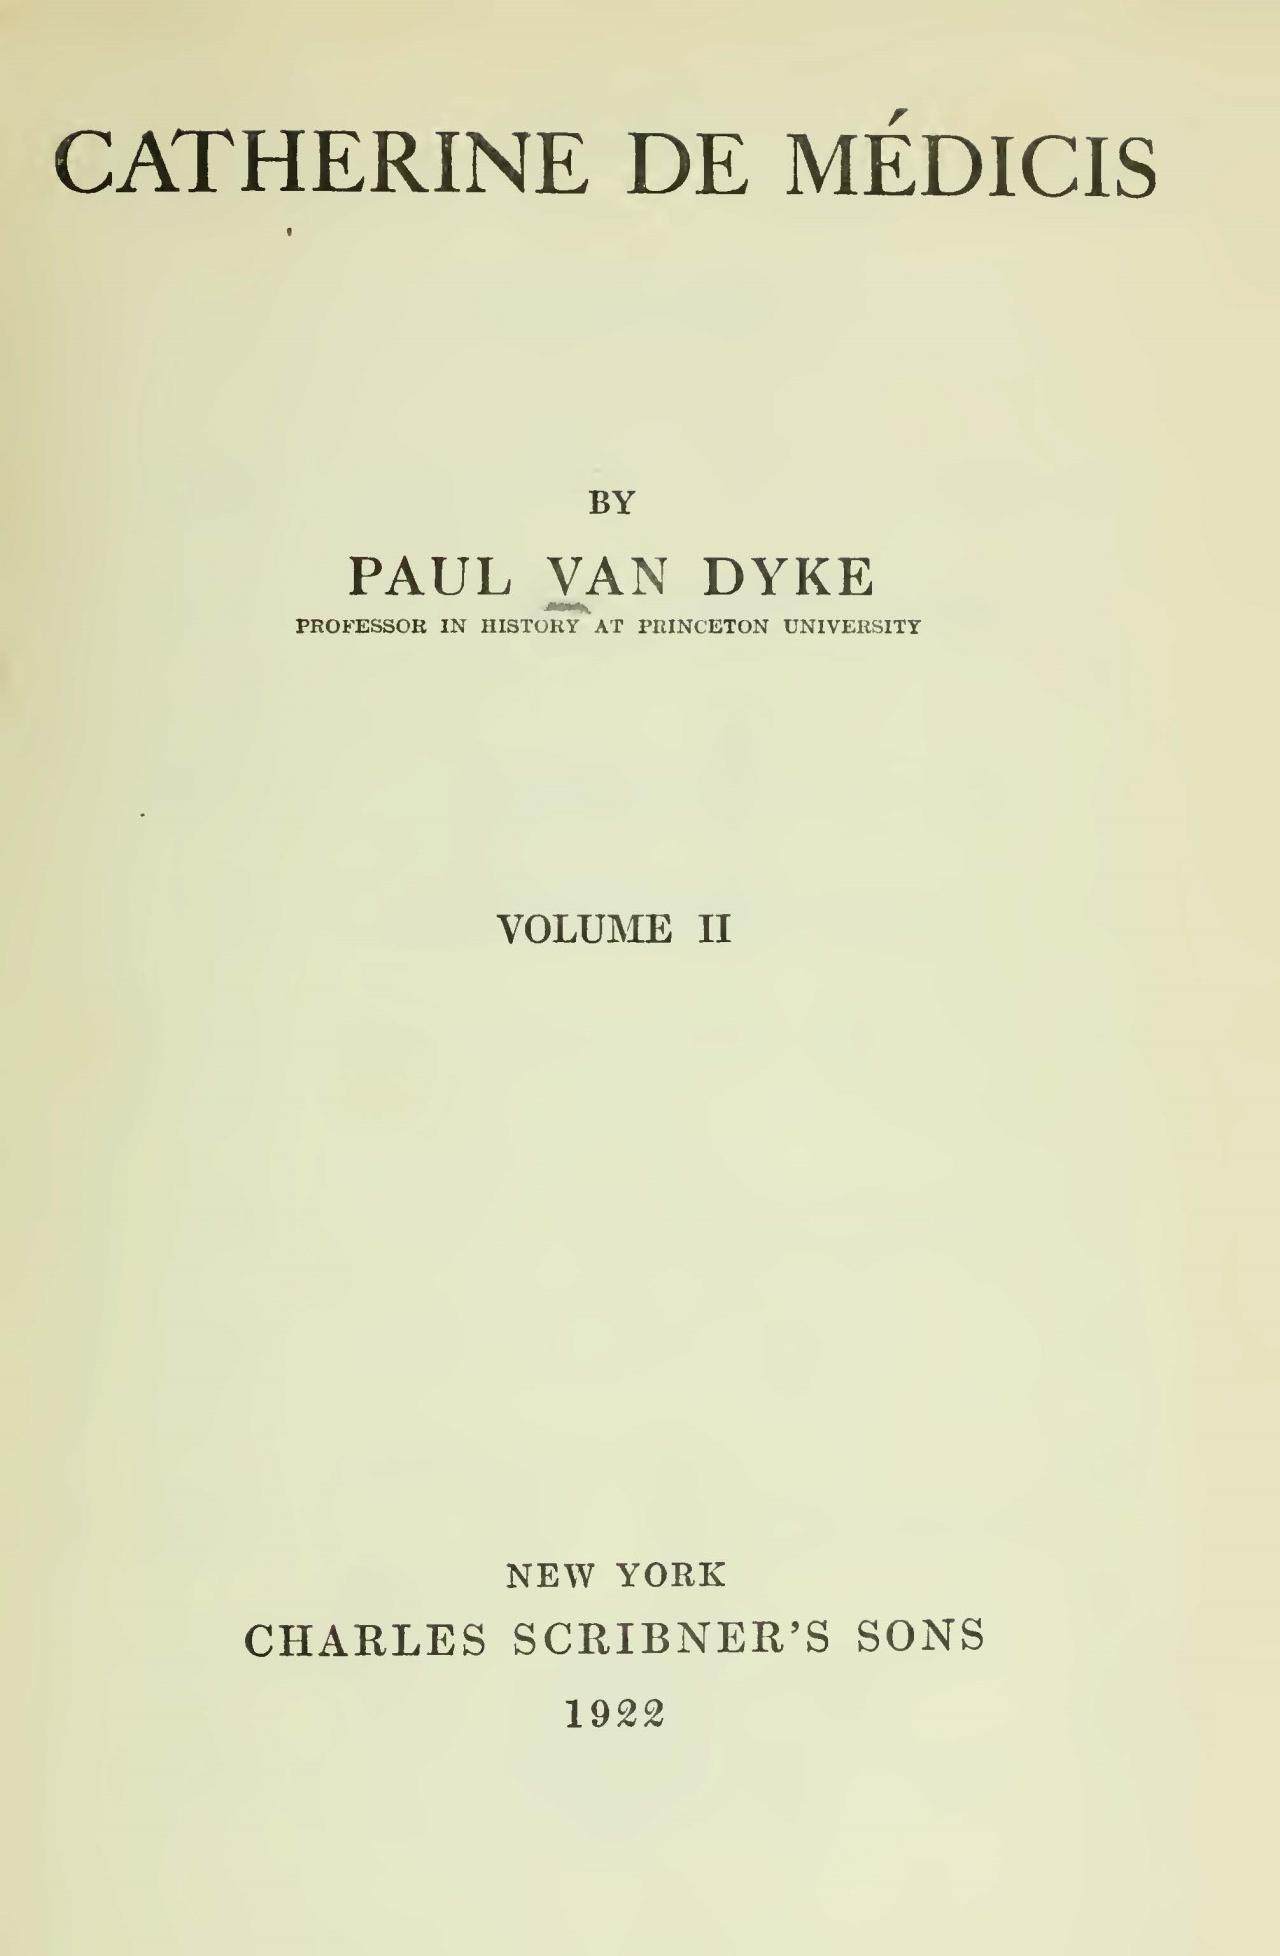 Van Dyke, Paul, Catherine de Medicis, Vol. 2 Title Page.jpg